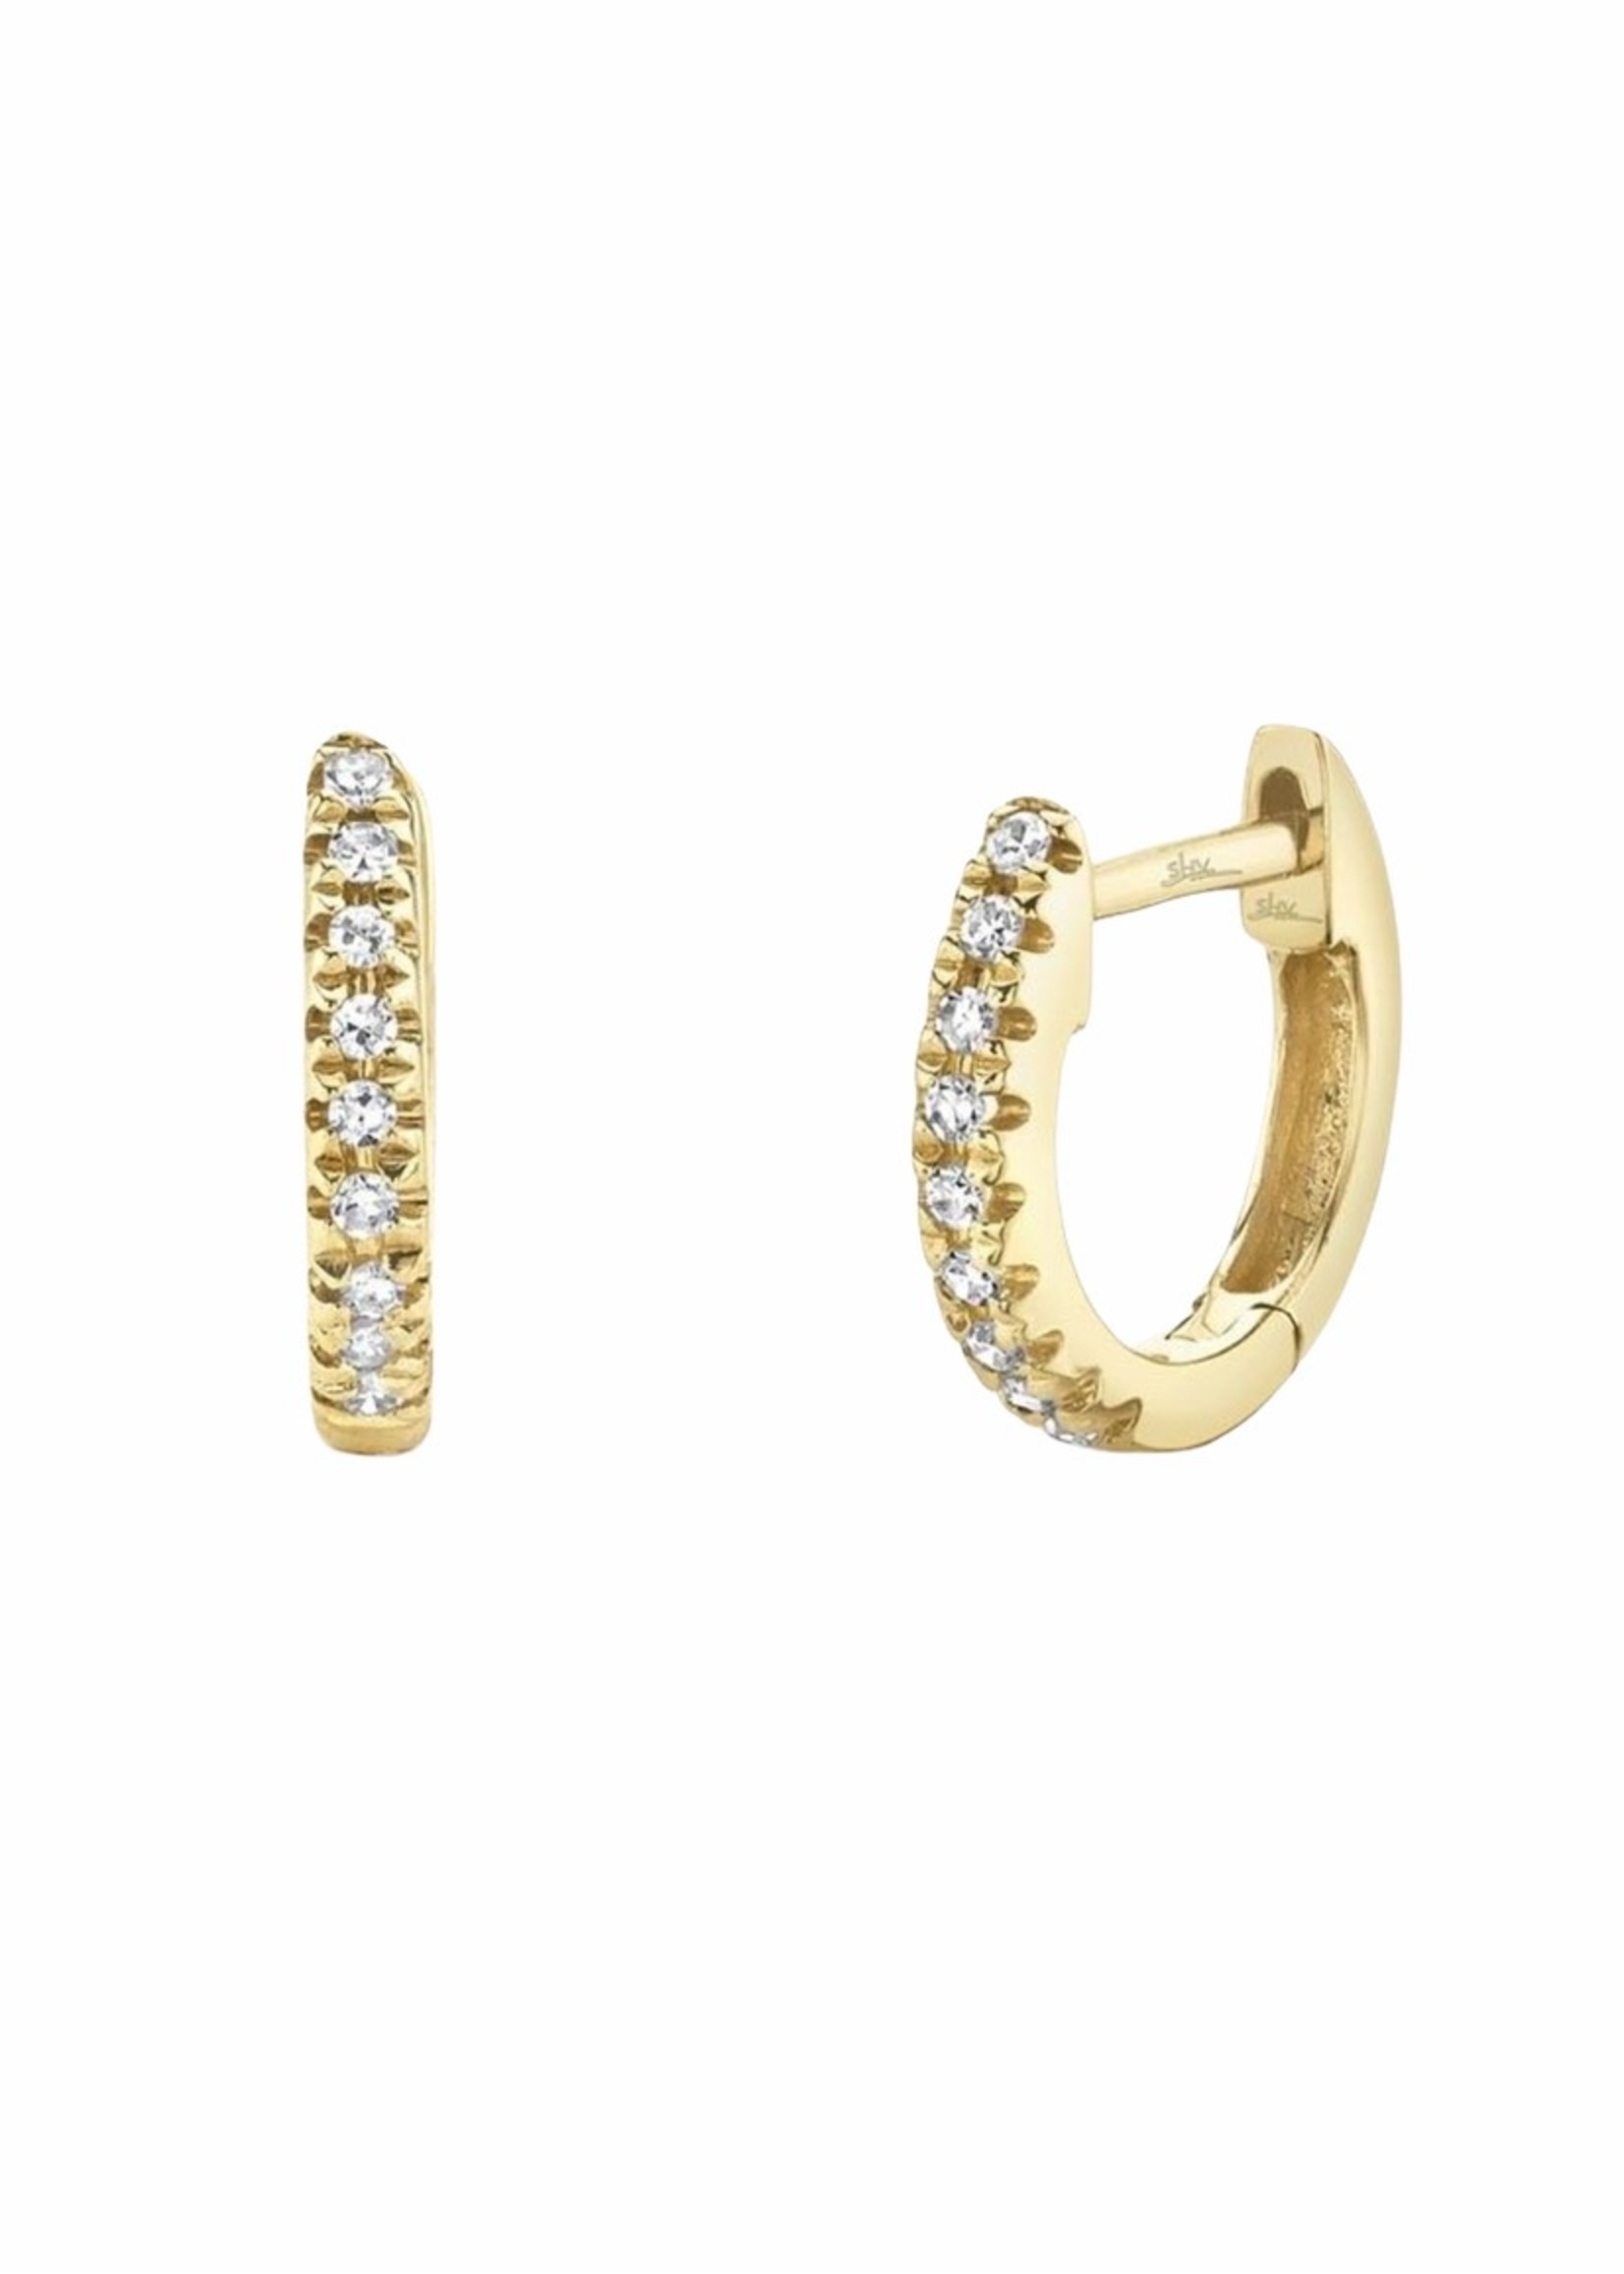 Jill Alberts Mini Diamond Huggie Earrings